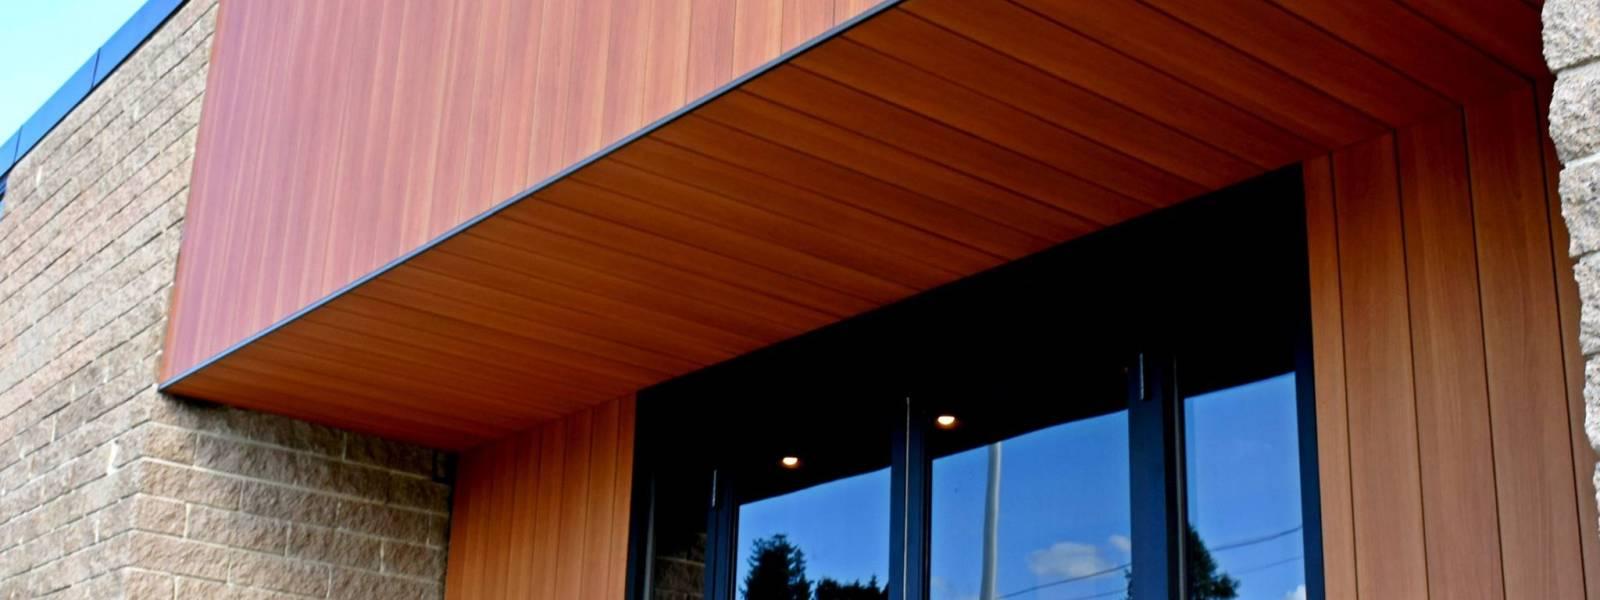 Trespa Pura vertical installation in New England